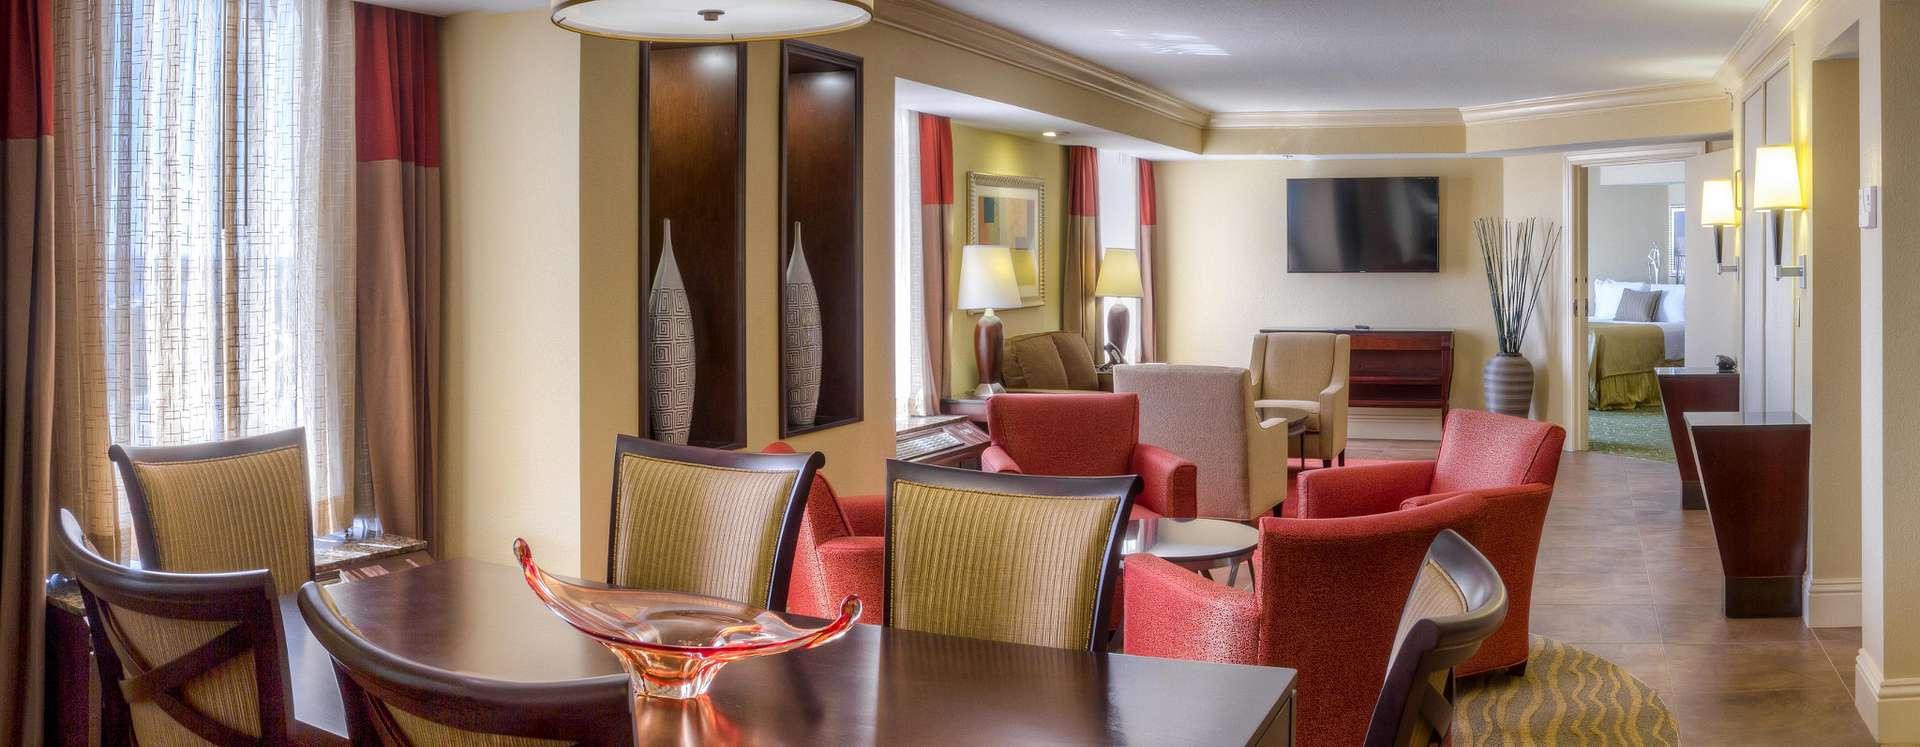 Rosen Centre Hotel Executive Suite parlor